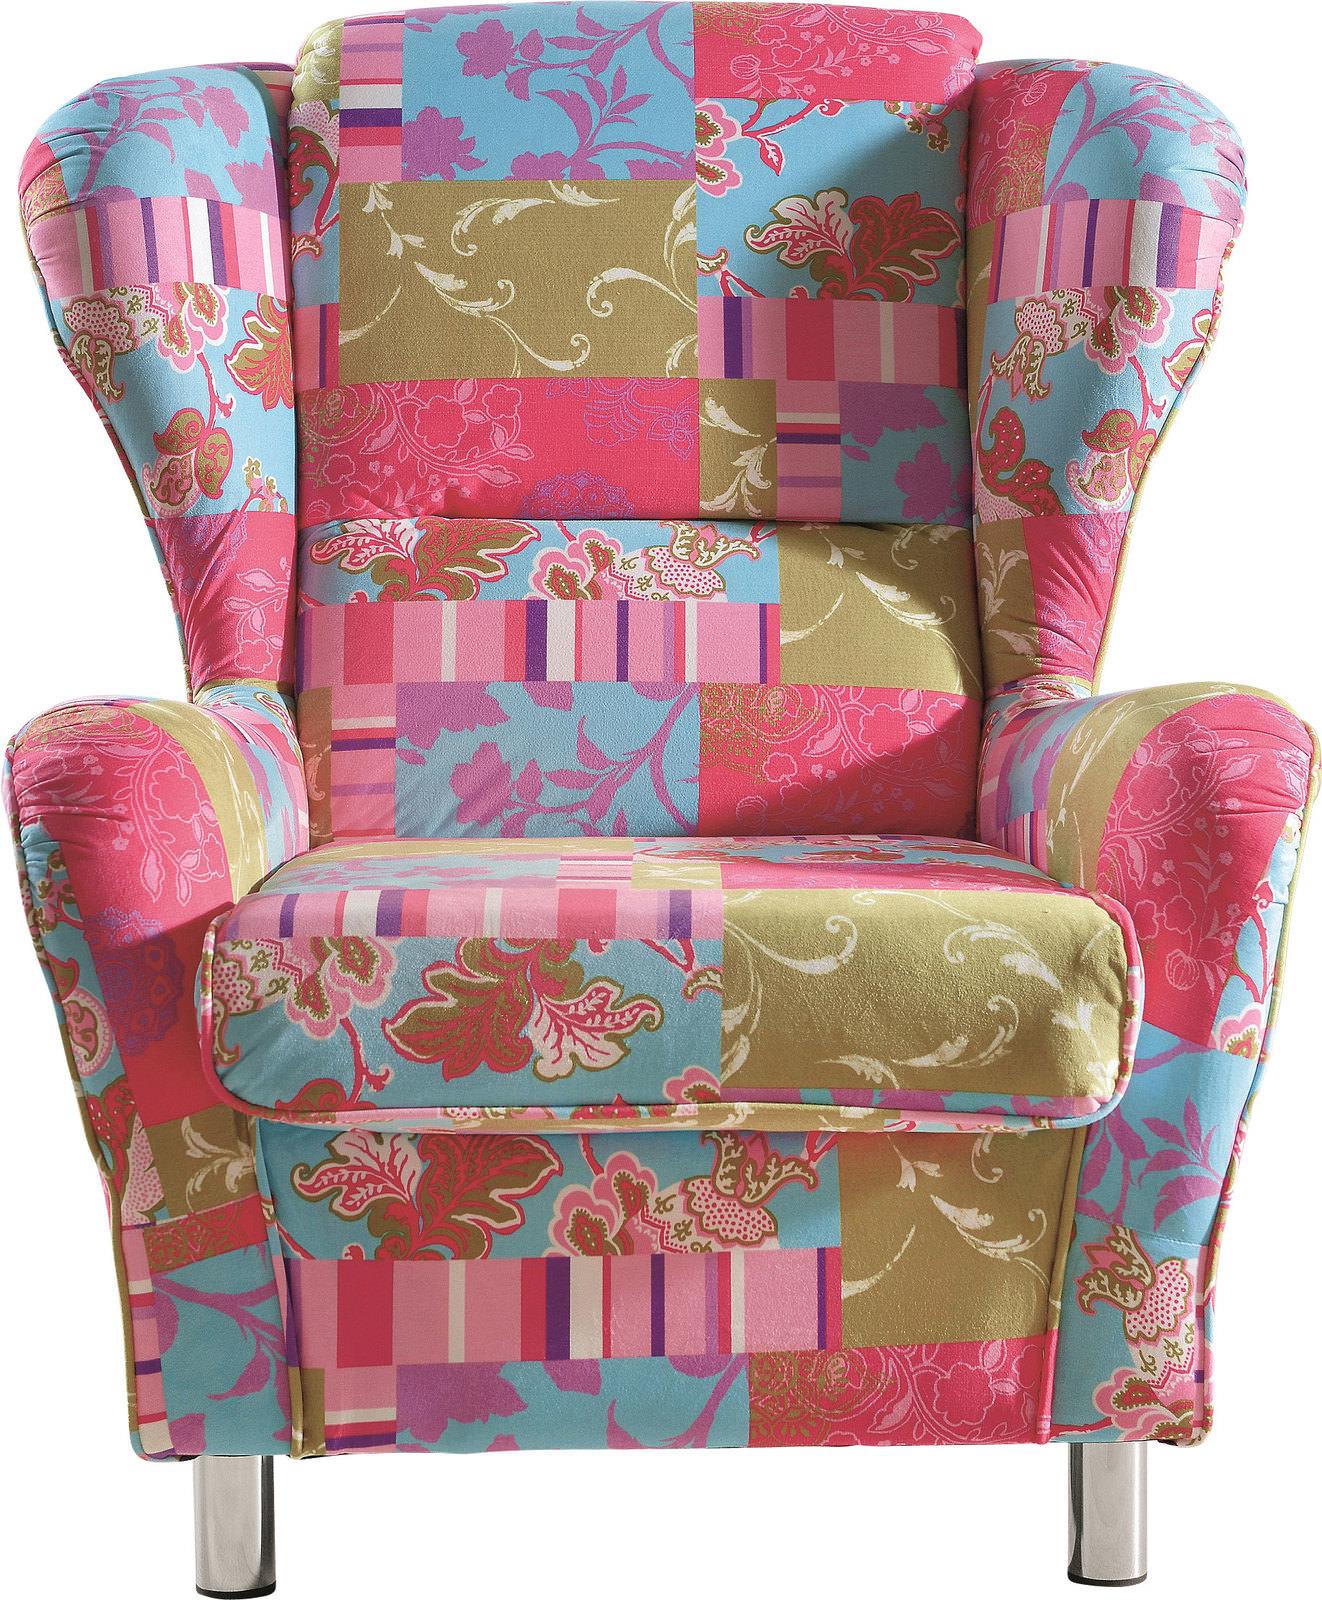 ohren sessel online entdecken knuffmann ihr m belhaus. Black Bedroom Furniture Sets. Home Design Ideas